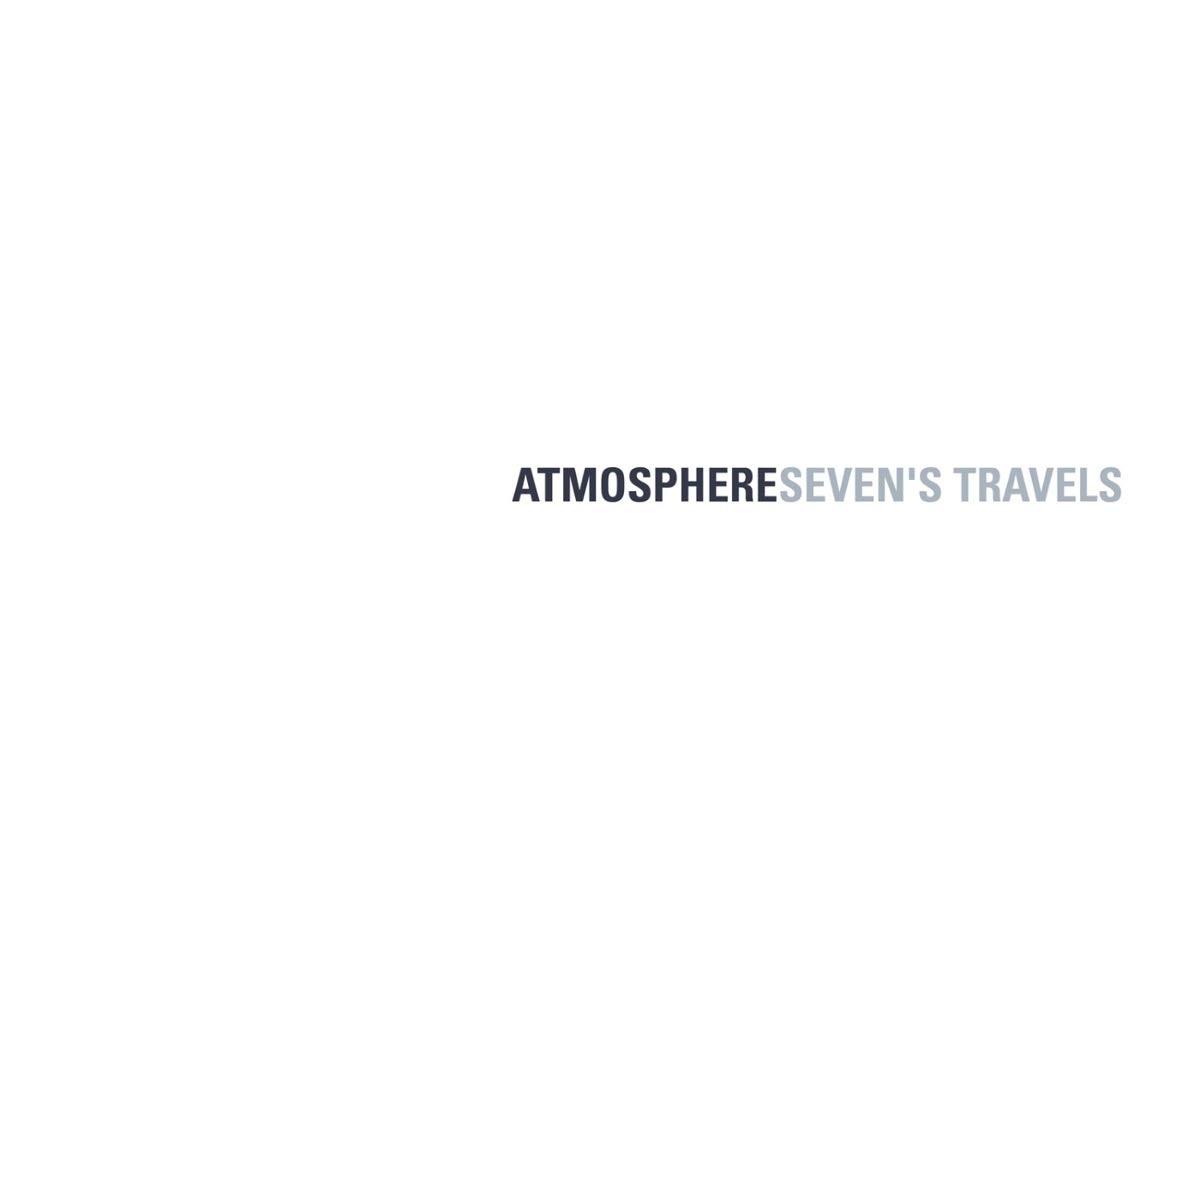 Atmosphere - Seven's Travels 3XLP Vinyl